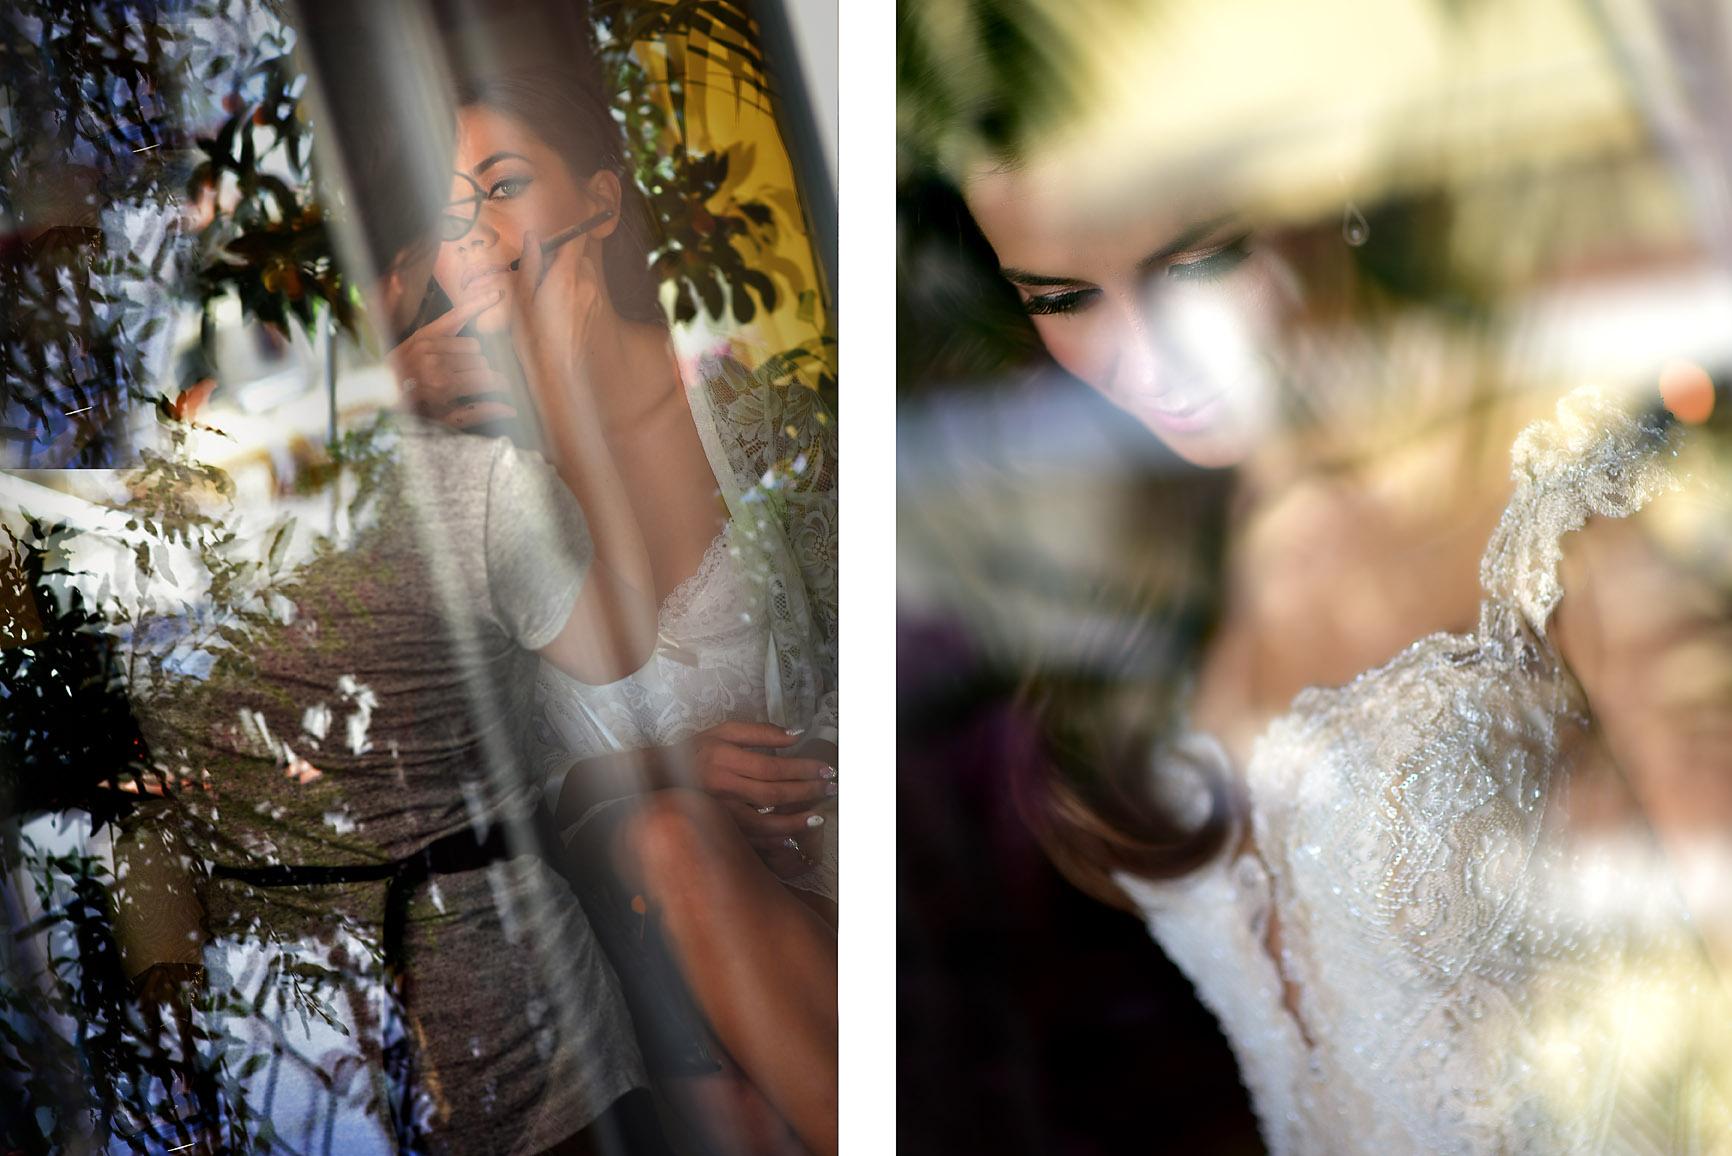 bride-beauty-make-up-wedding-dress-larissa-alexis-koumaditis-photography